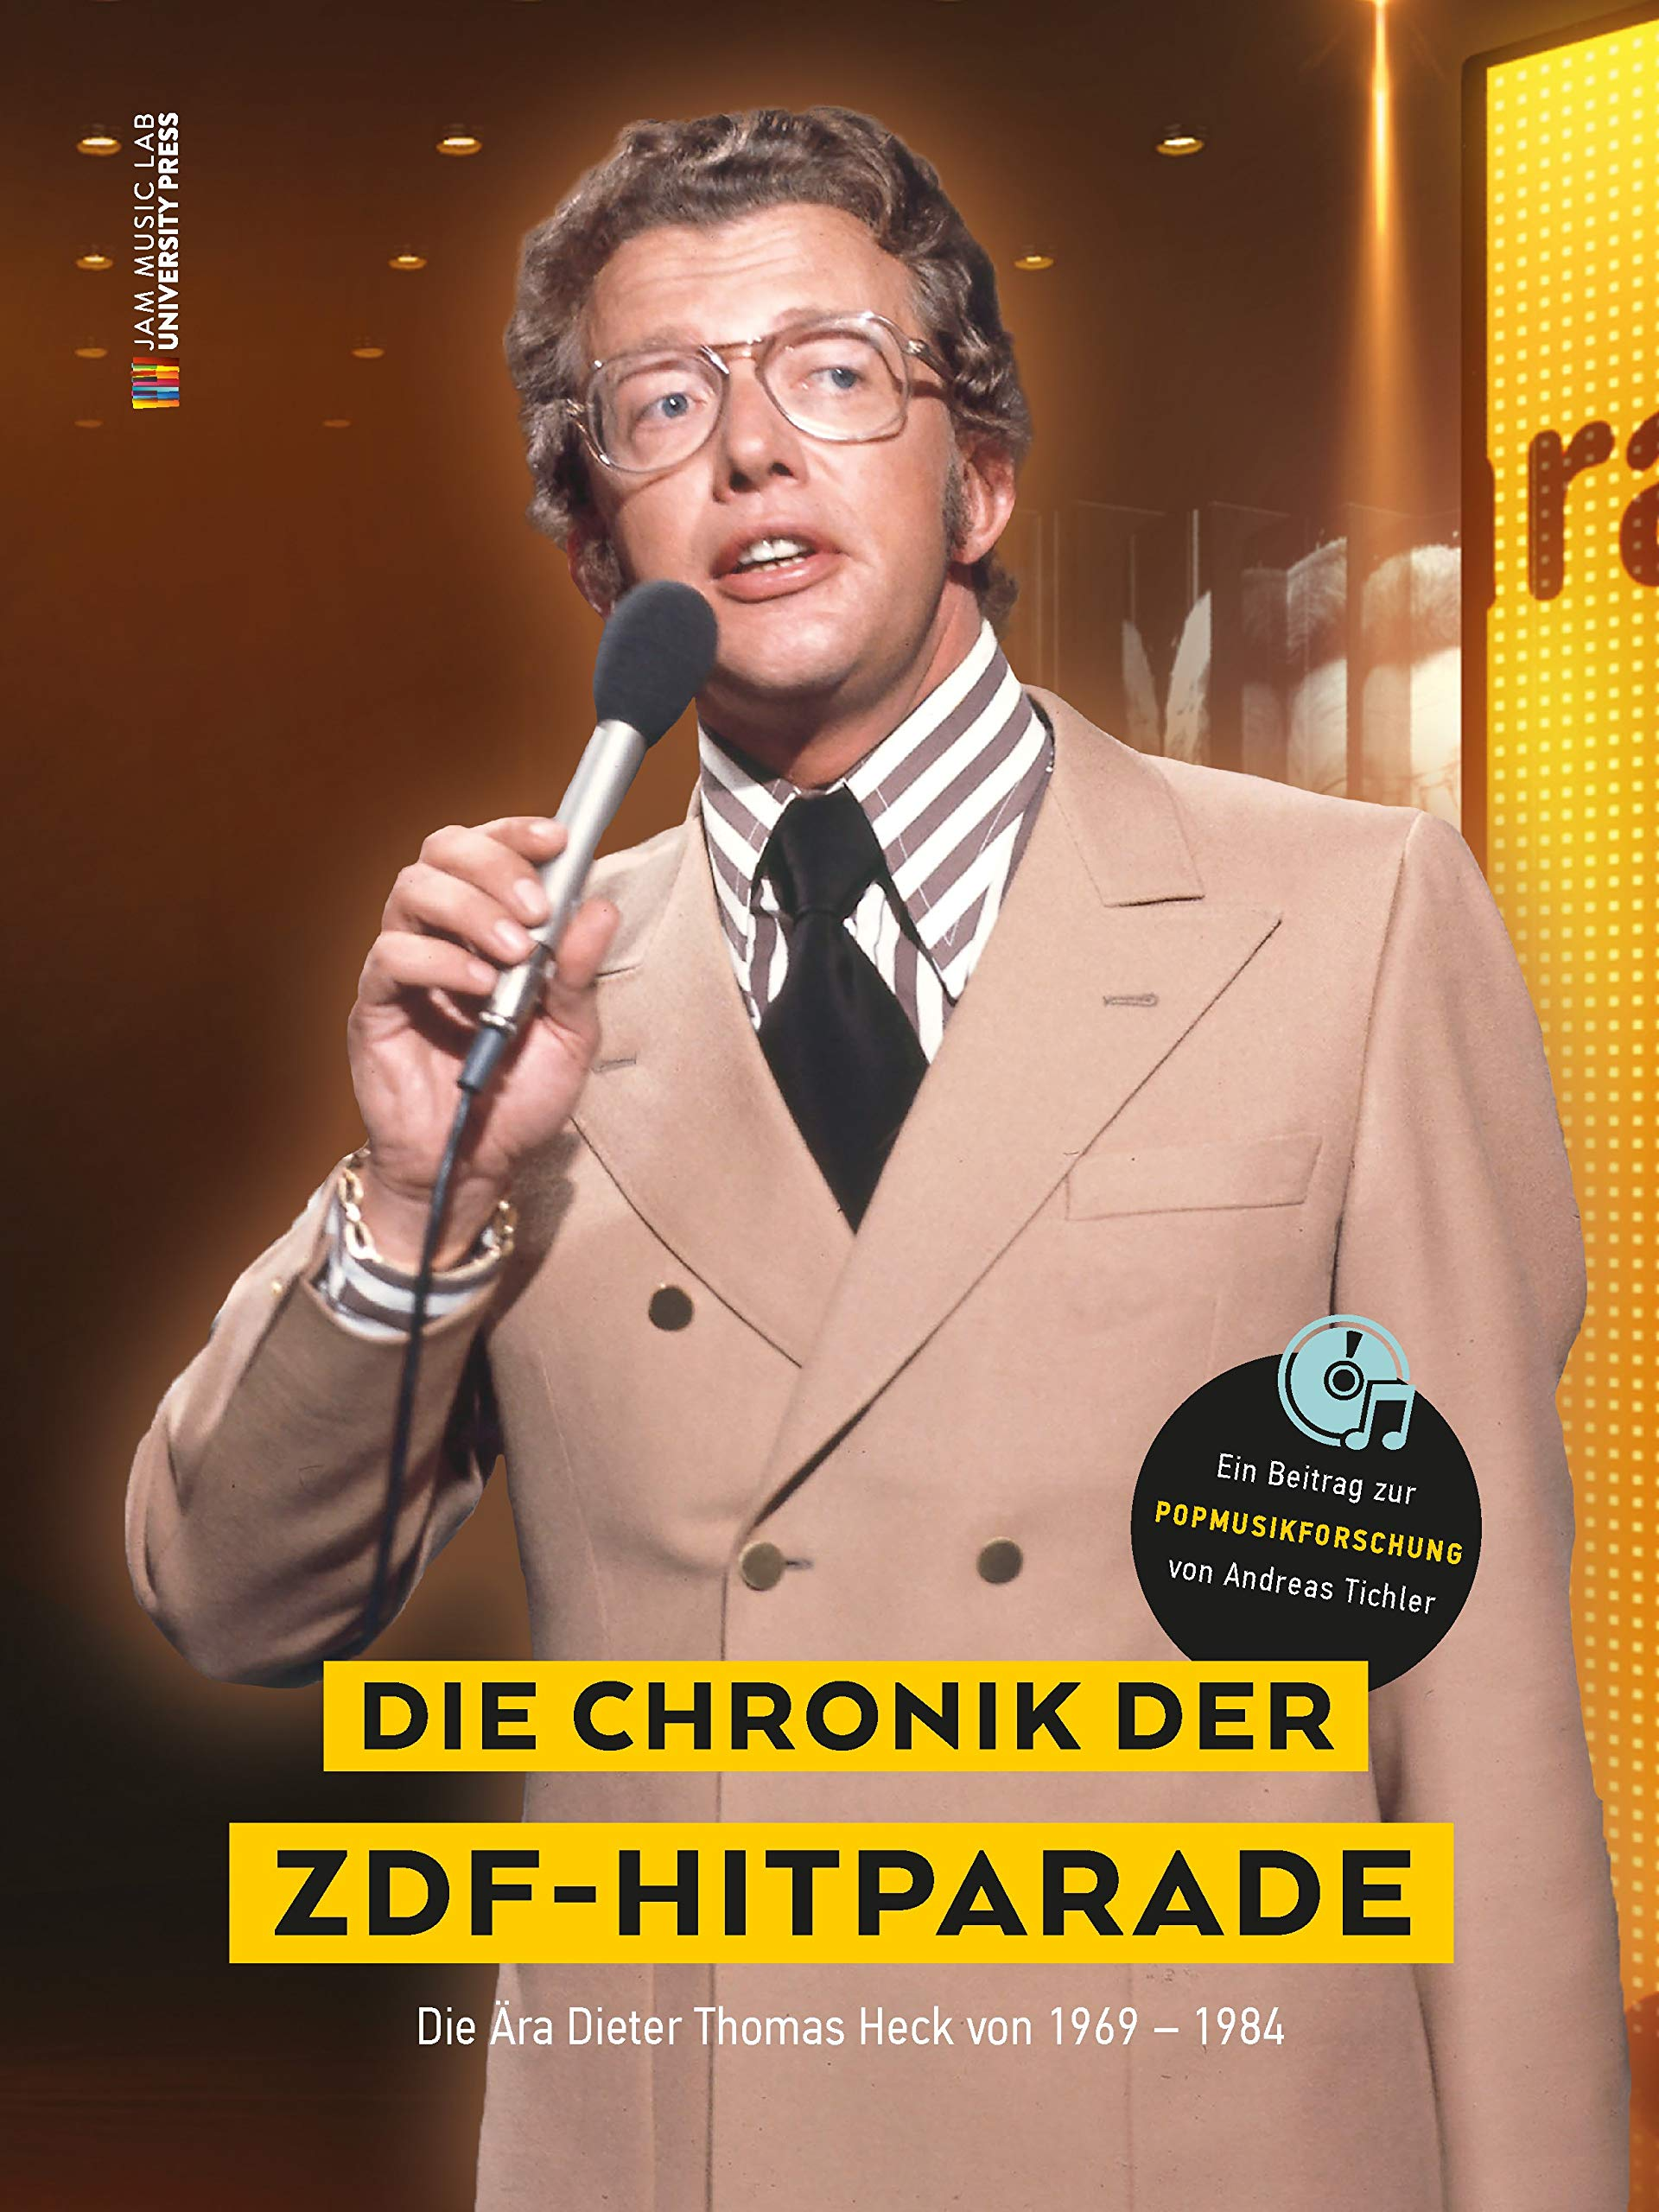 Die Chronik der ZDF-Hitparade - Die Ära Dieter Thomas Heck 1969 - 1984